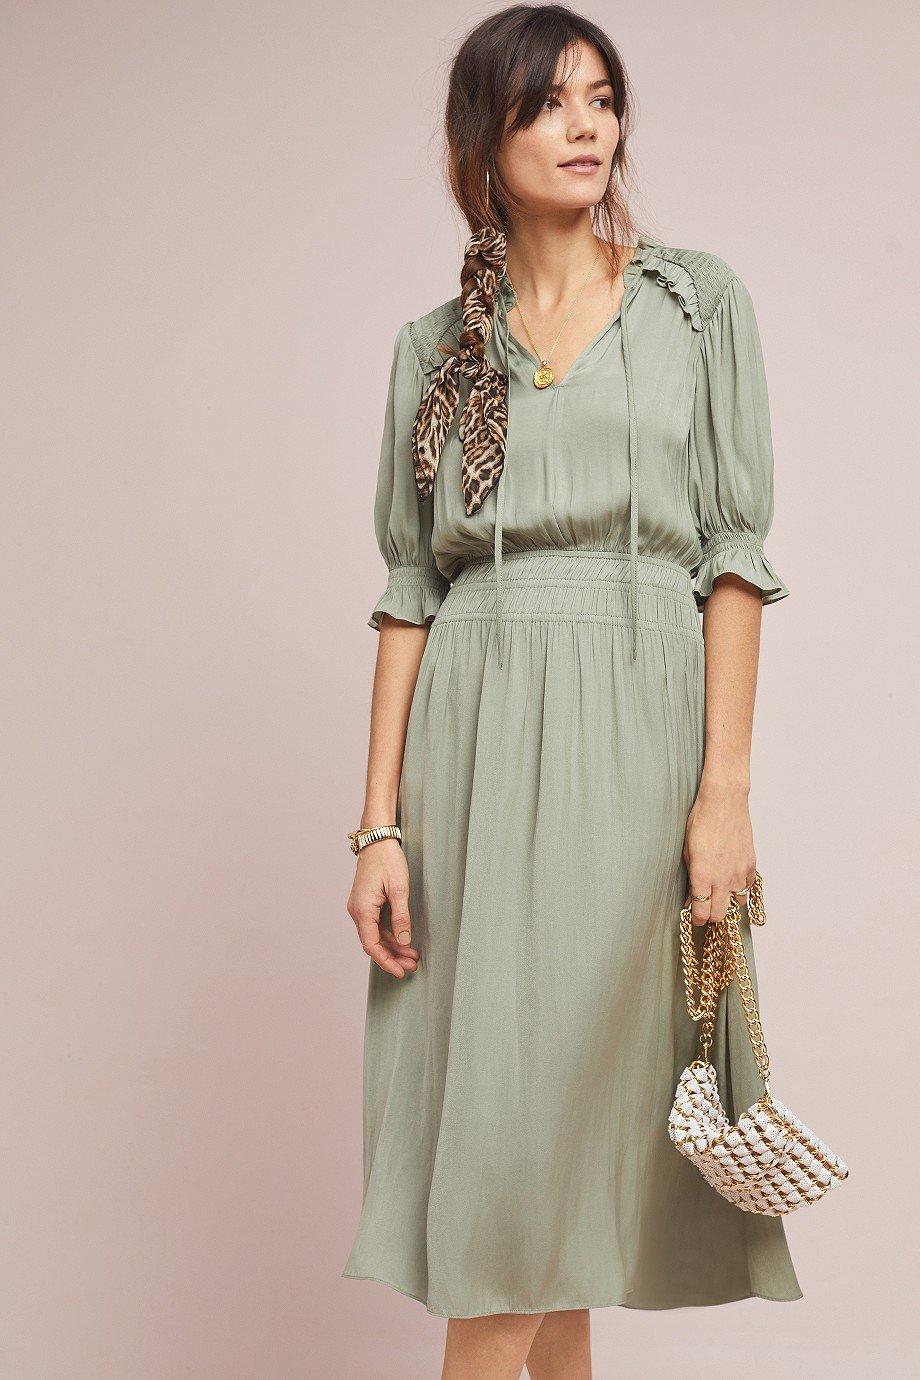 Cape May Midi Dress